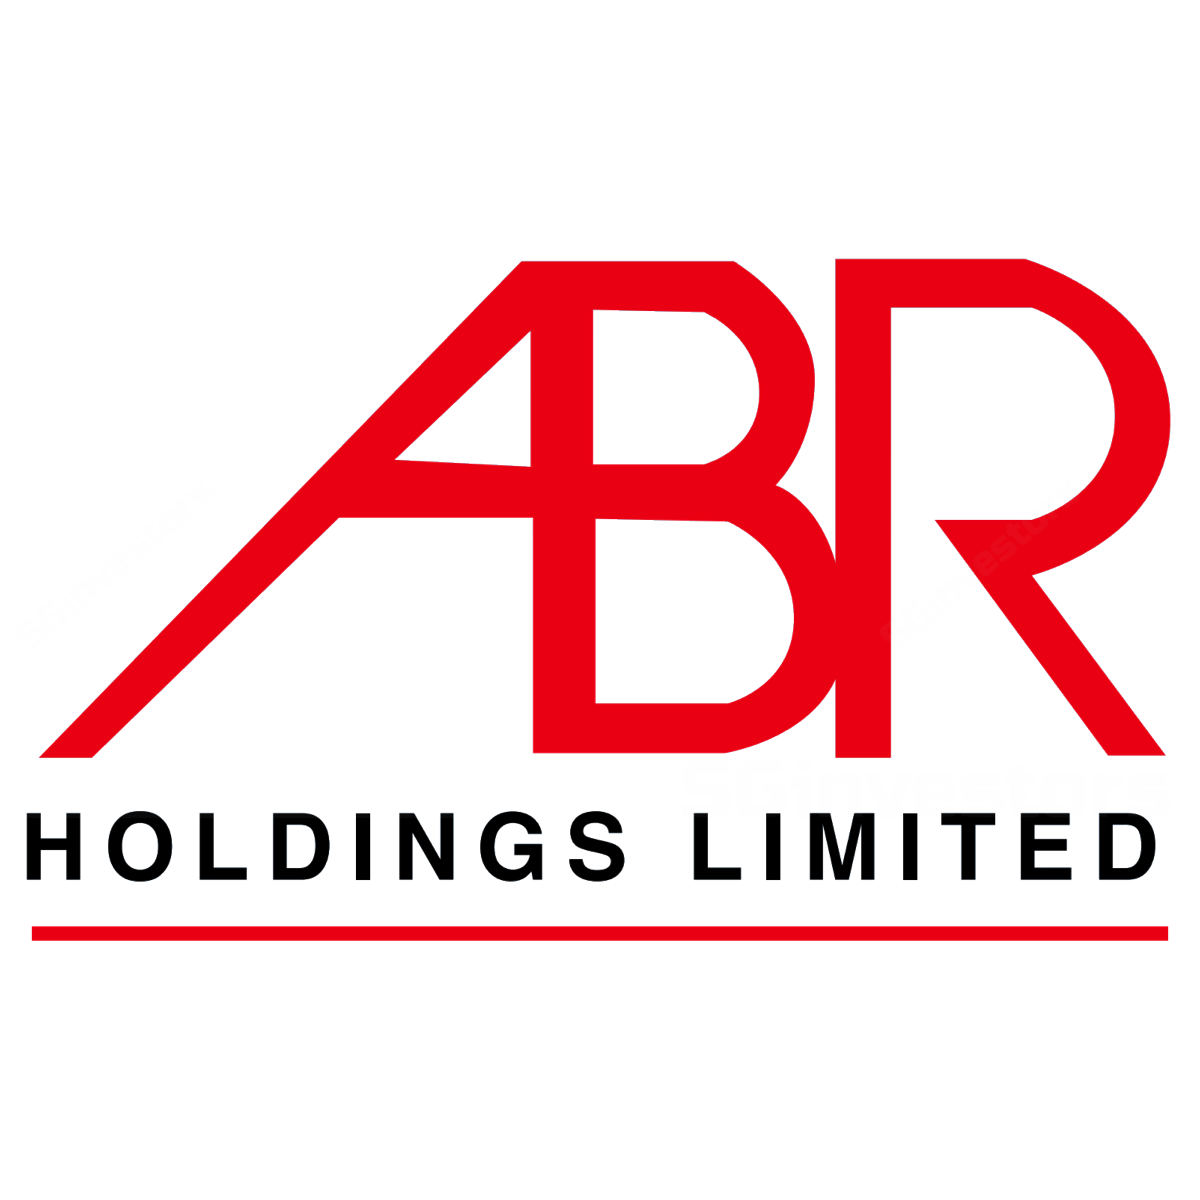 ABR HOLDINGS LIMITED (SGX:533) @ SGinvestors.io